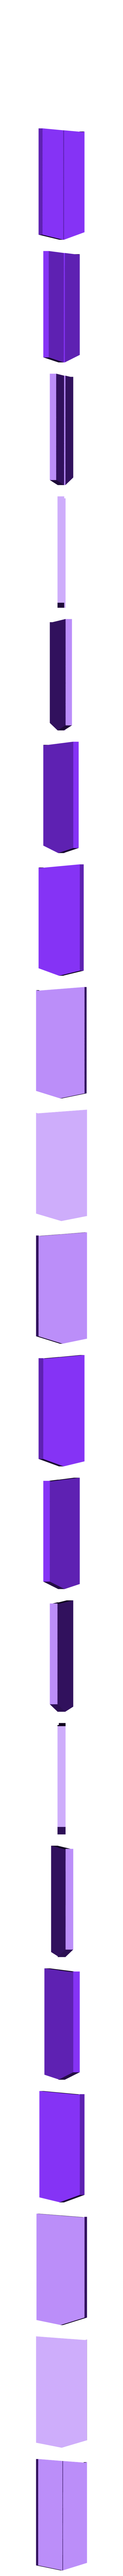 Table_leg_02.stl Download free STL file Metaphor • 3D printing template, JayOmega